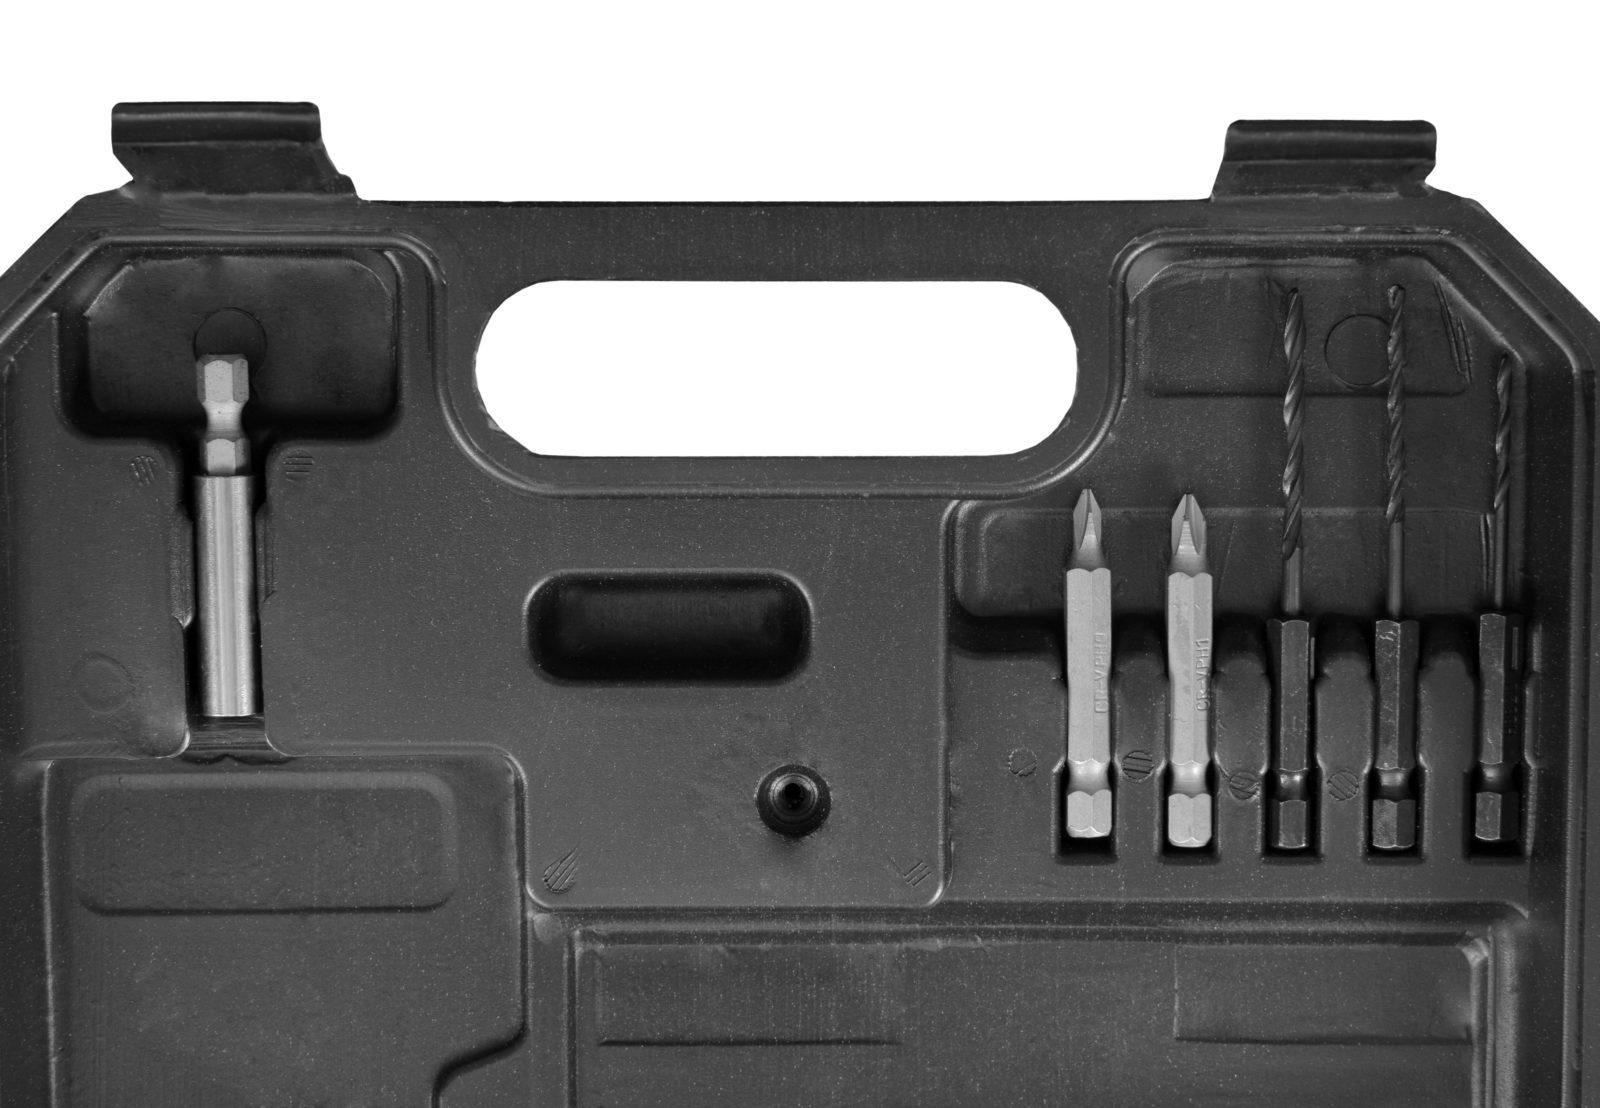 Aparafusadora 3.6volts 27pcs  HCT SD1152B